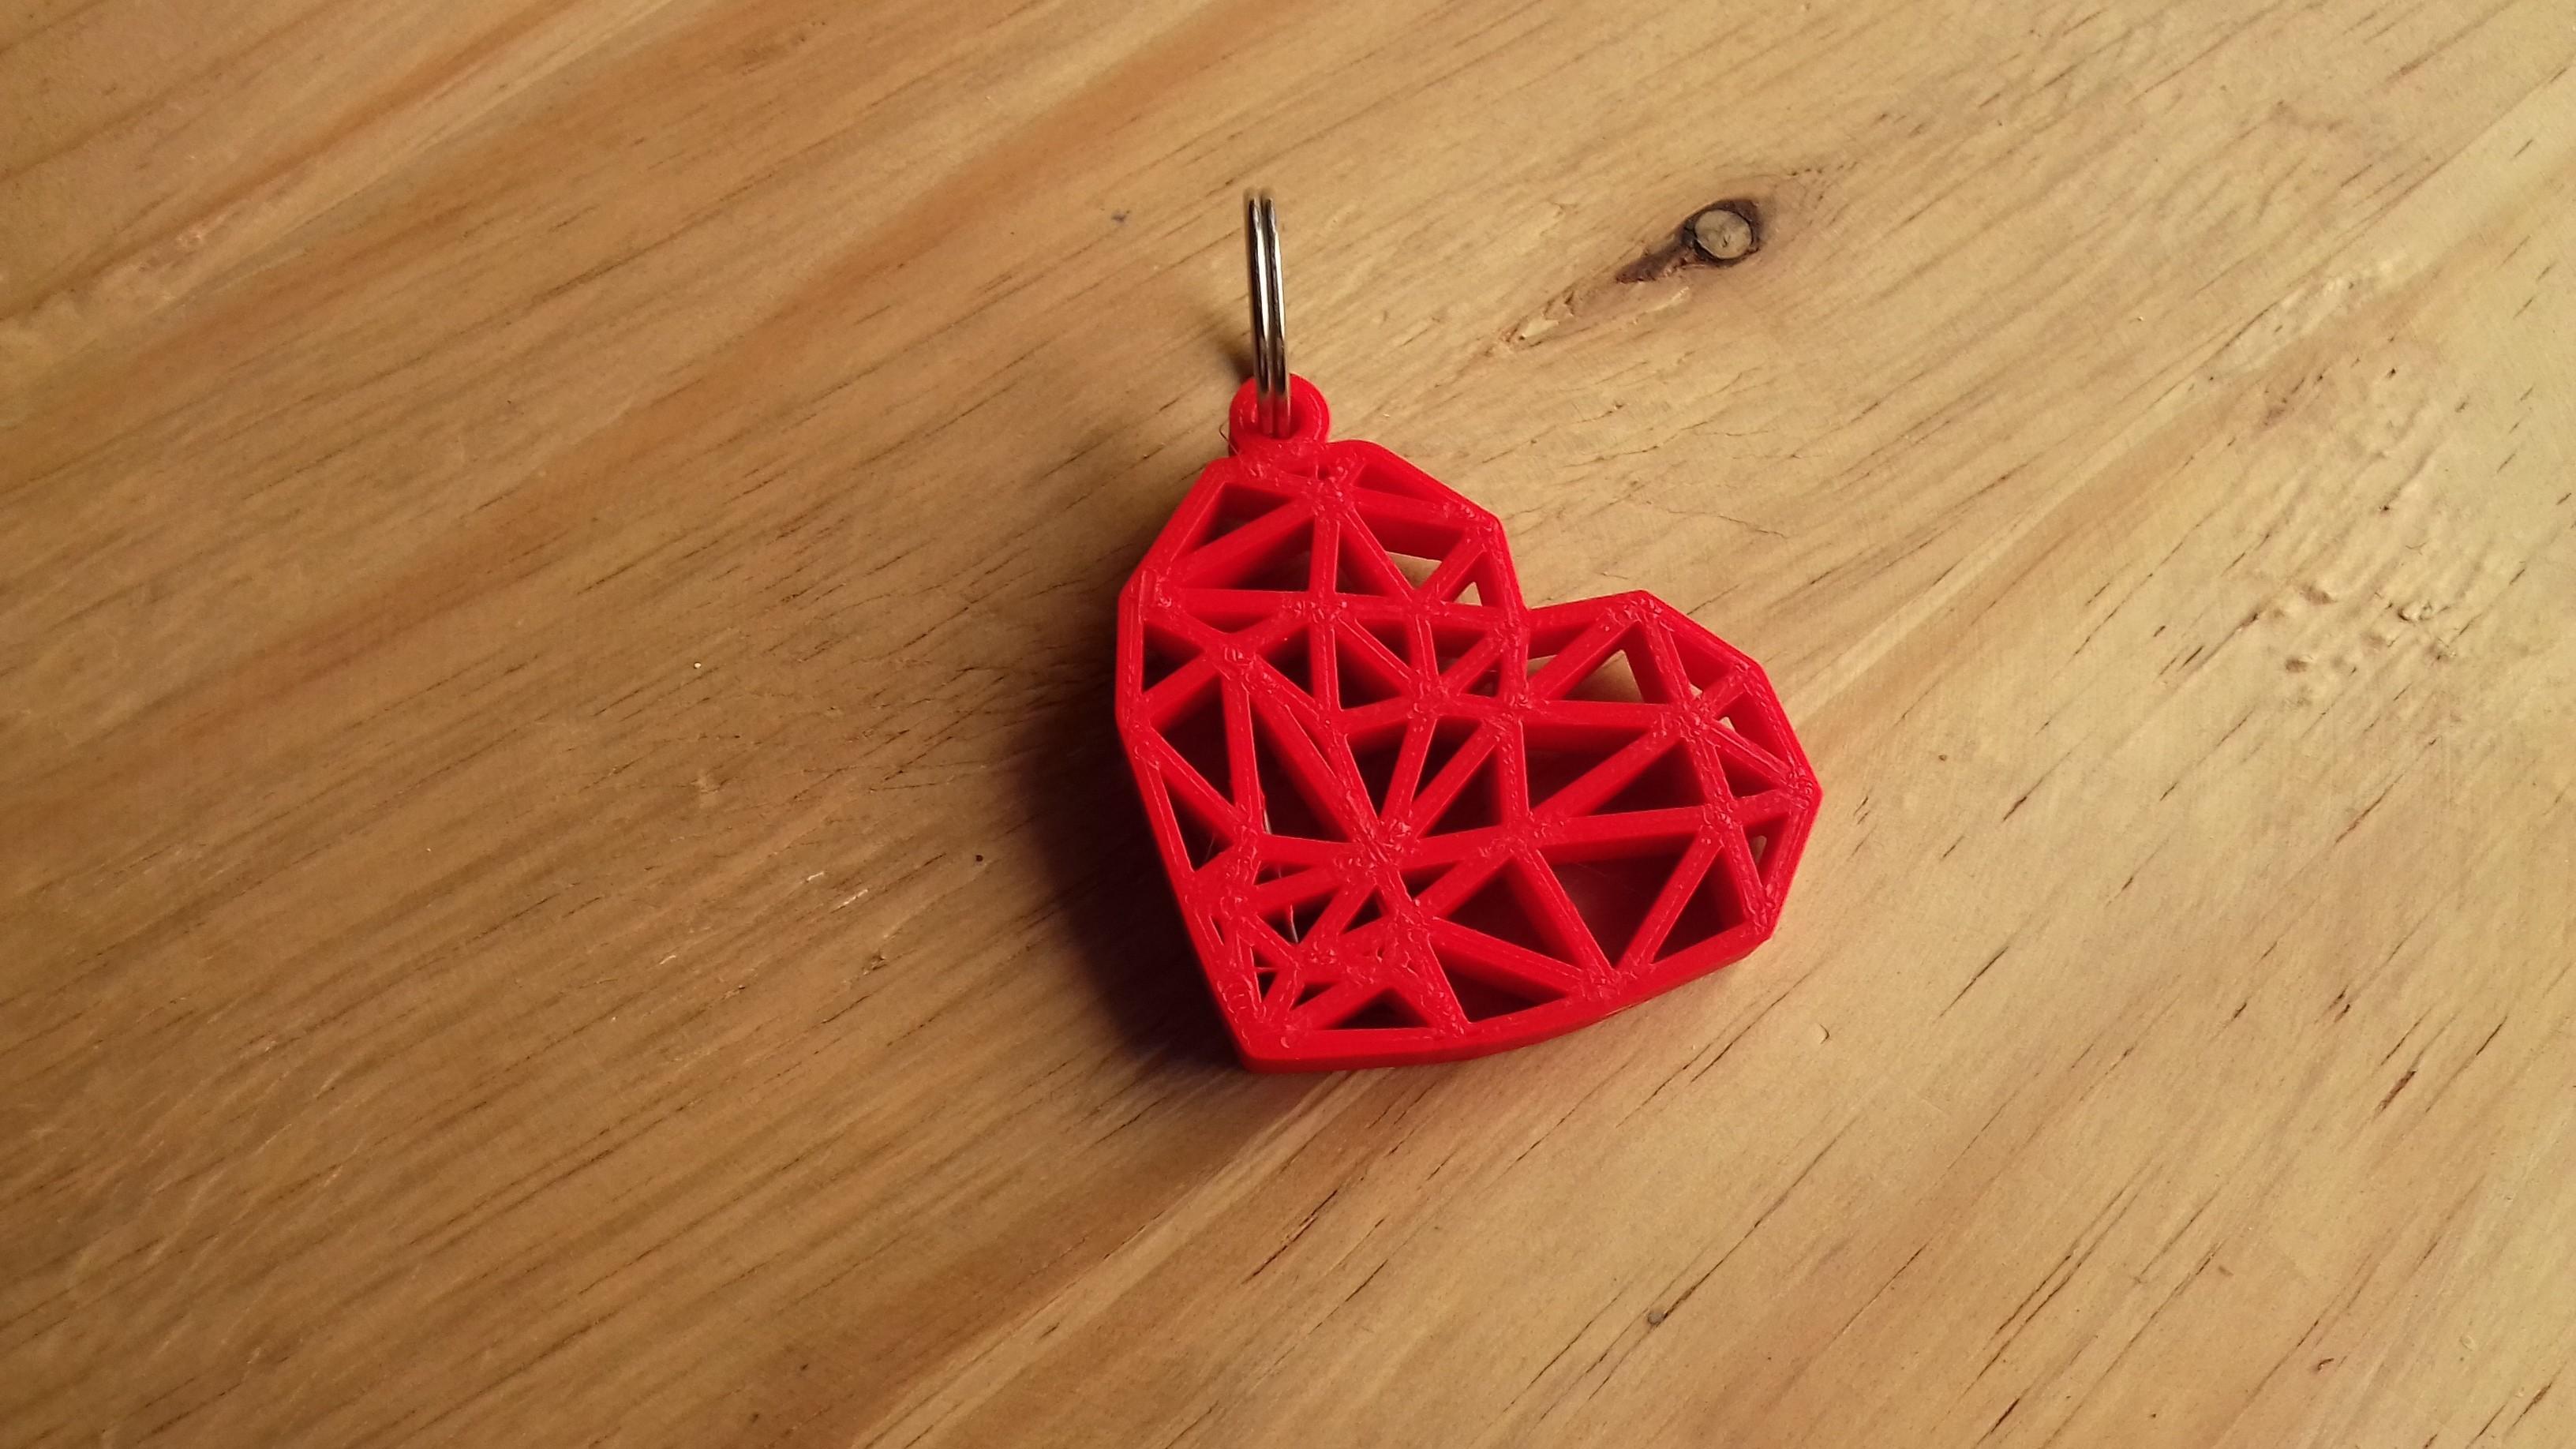 20180205_131833.jpg Download free STL file Geometric Heart Key Ring • 3D print model, Cancore_3D